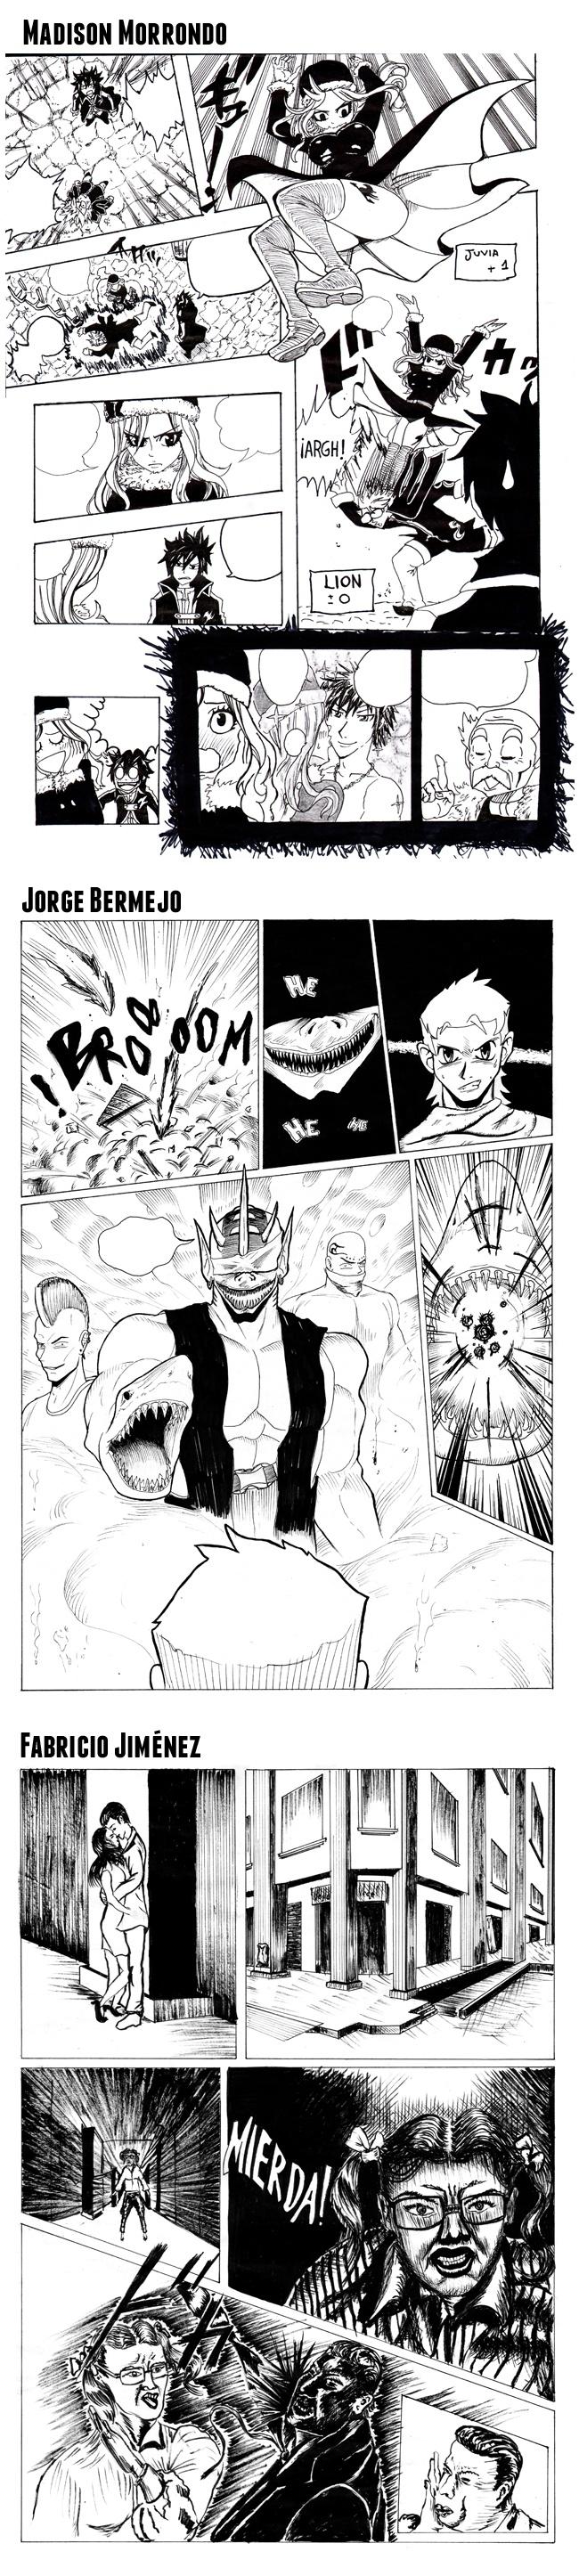 trabajos-alumnos-masterc10-academiac10-manga-comic-madrid